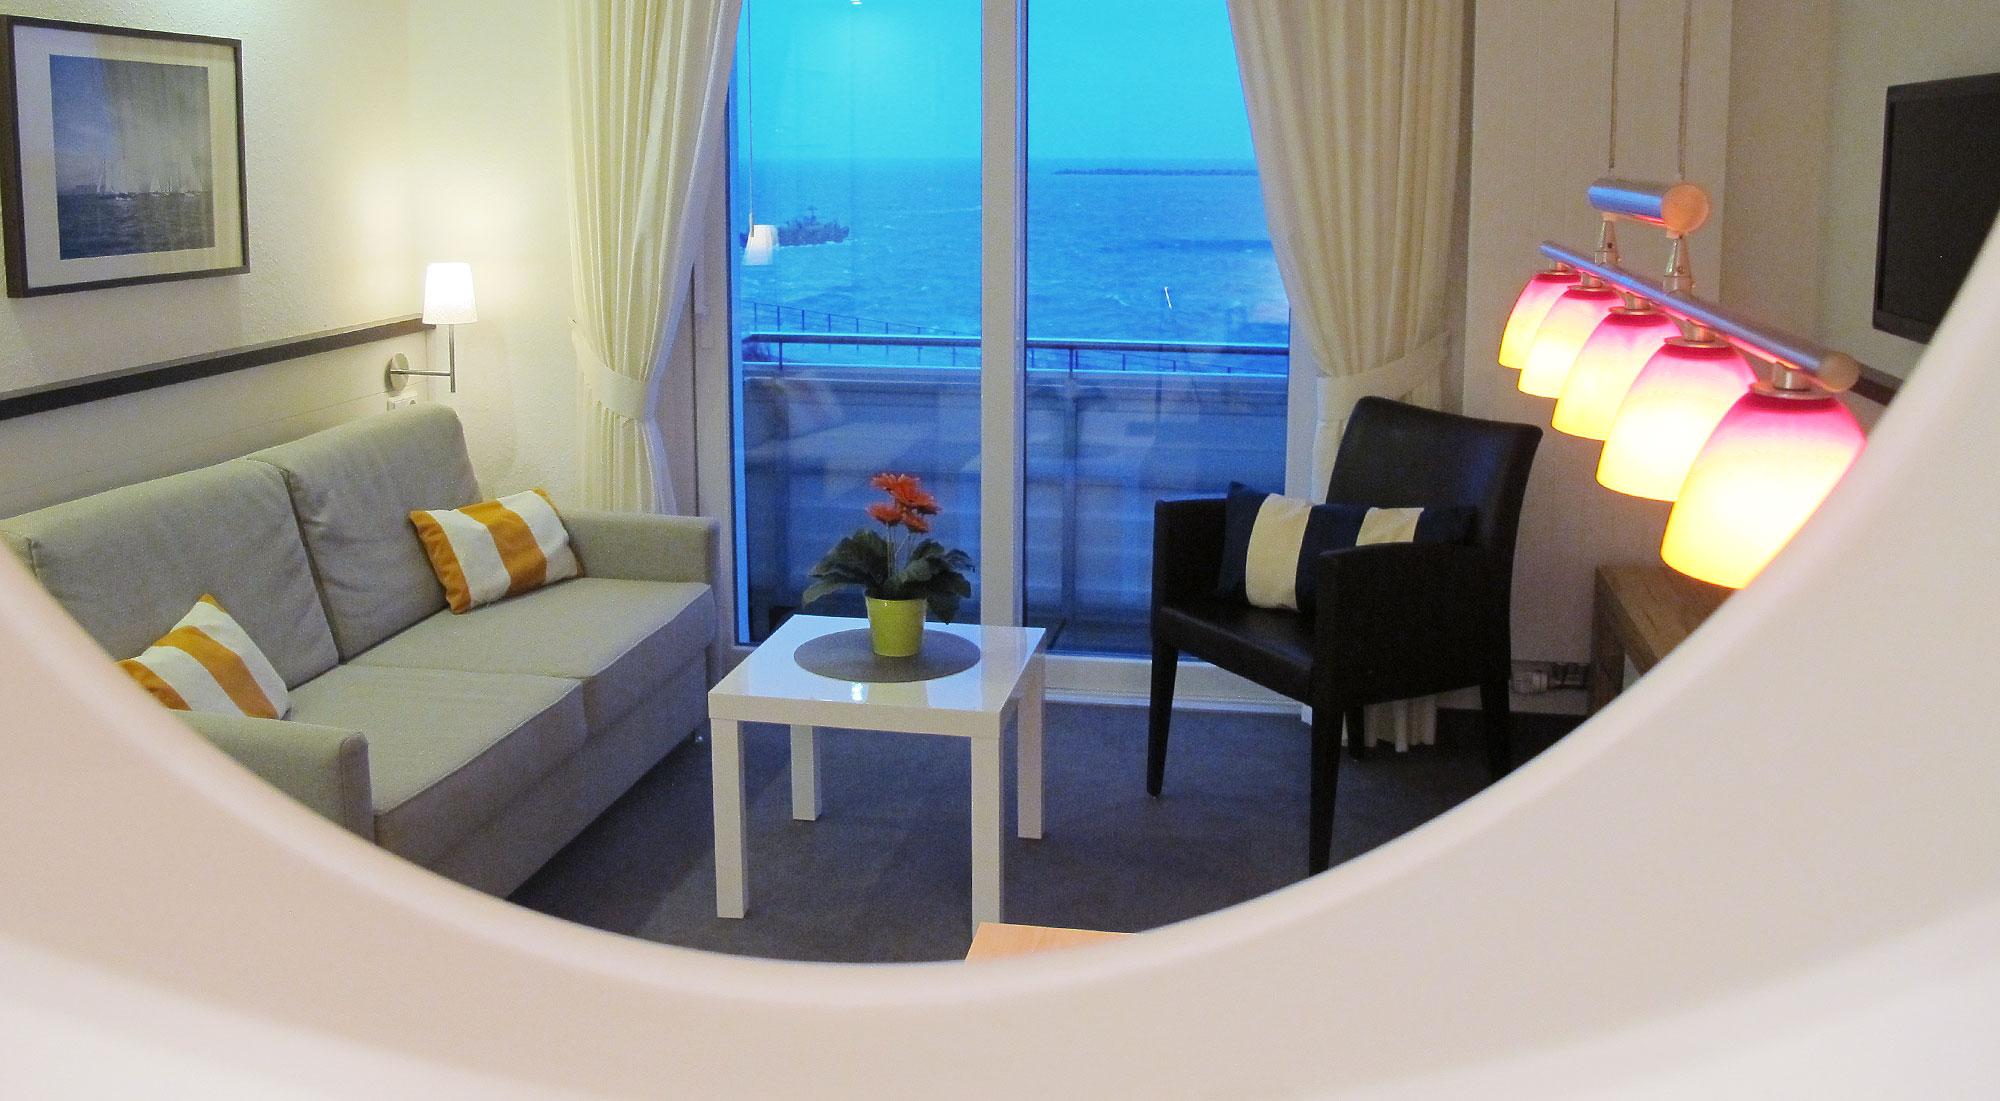 Haus Miramar Appartement, Seeblick, Balkon